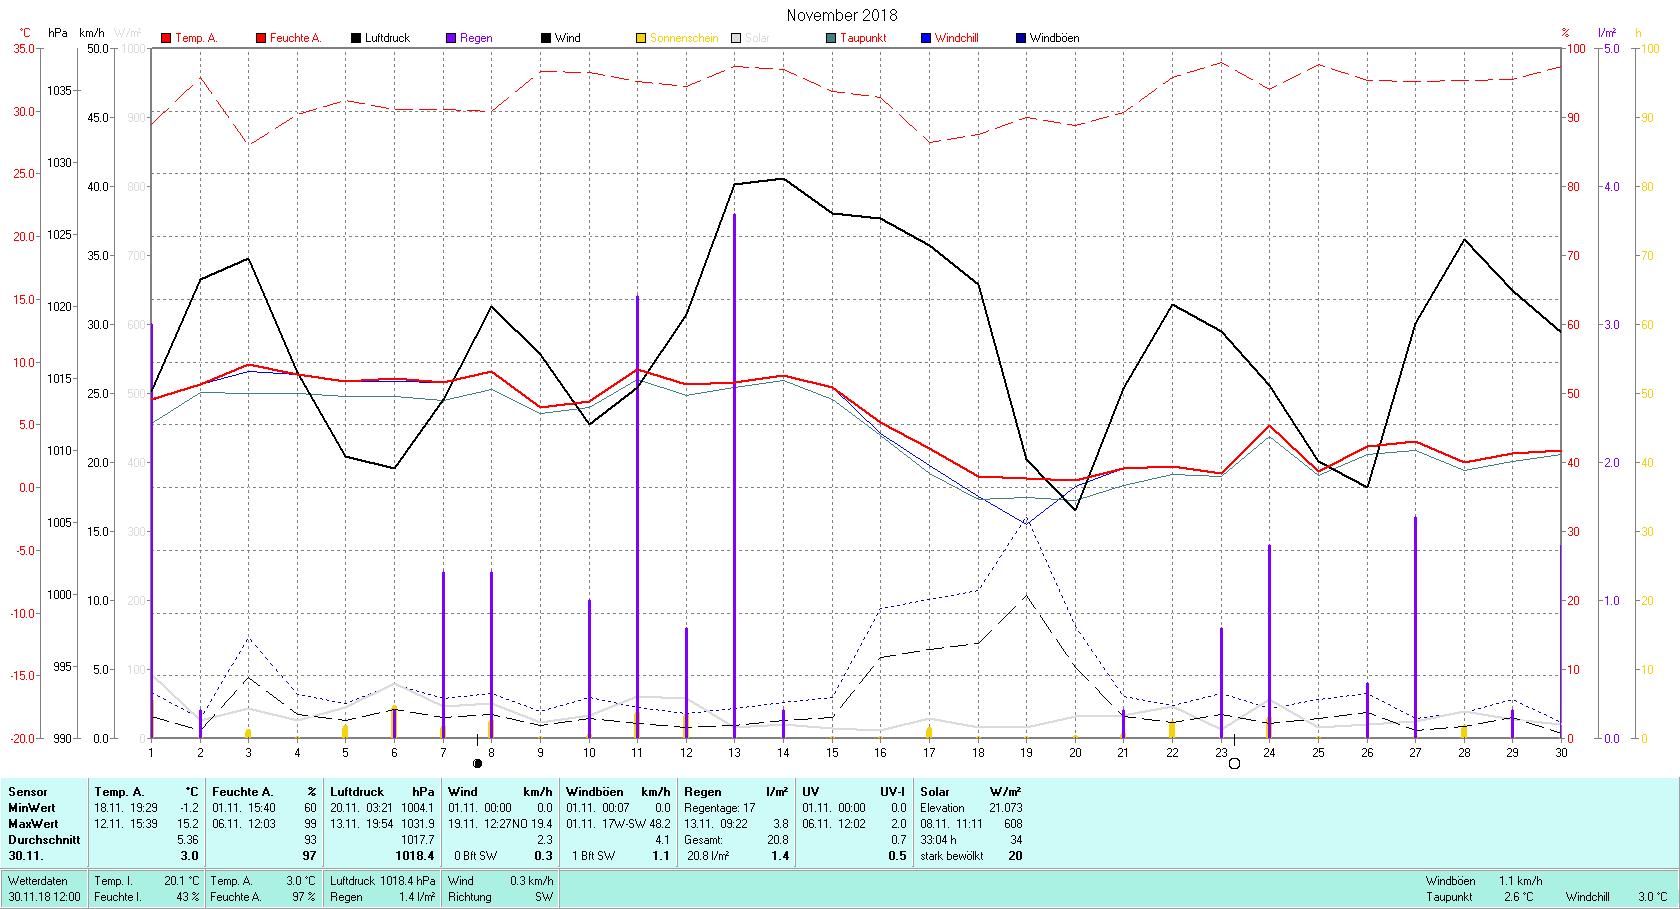 November 2018 Tmin -1.2°C, Tmax 15.2°C, Sonne 33:04 h, Niederschlag 20.8mm/2